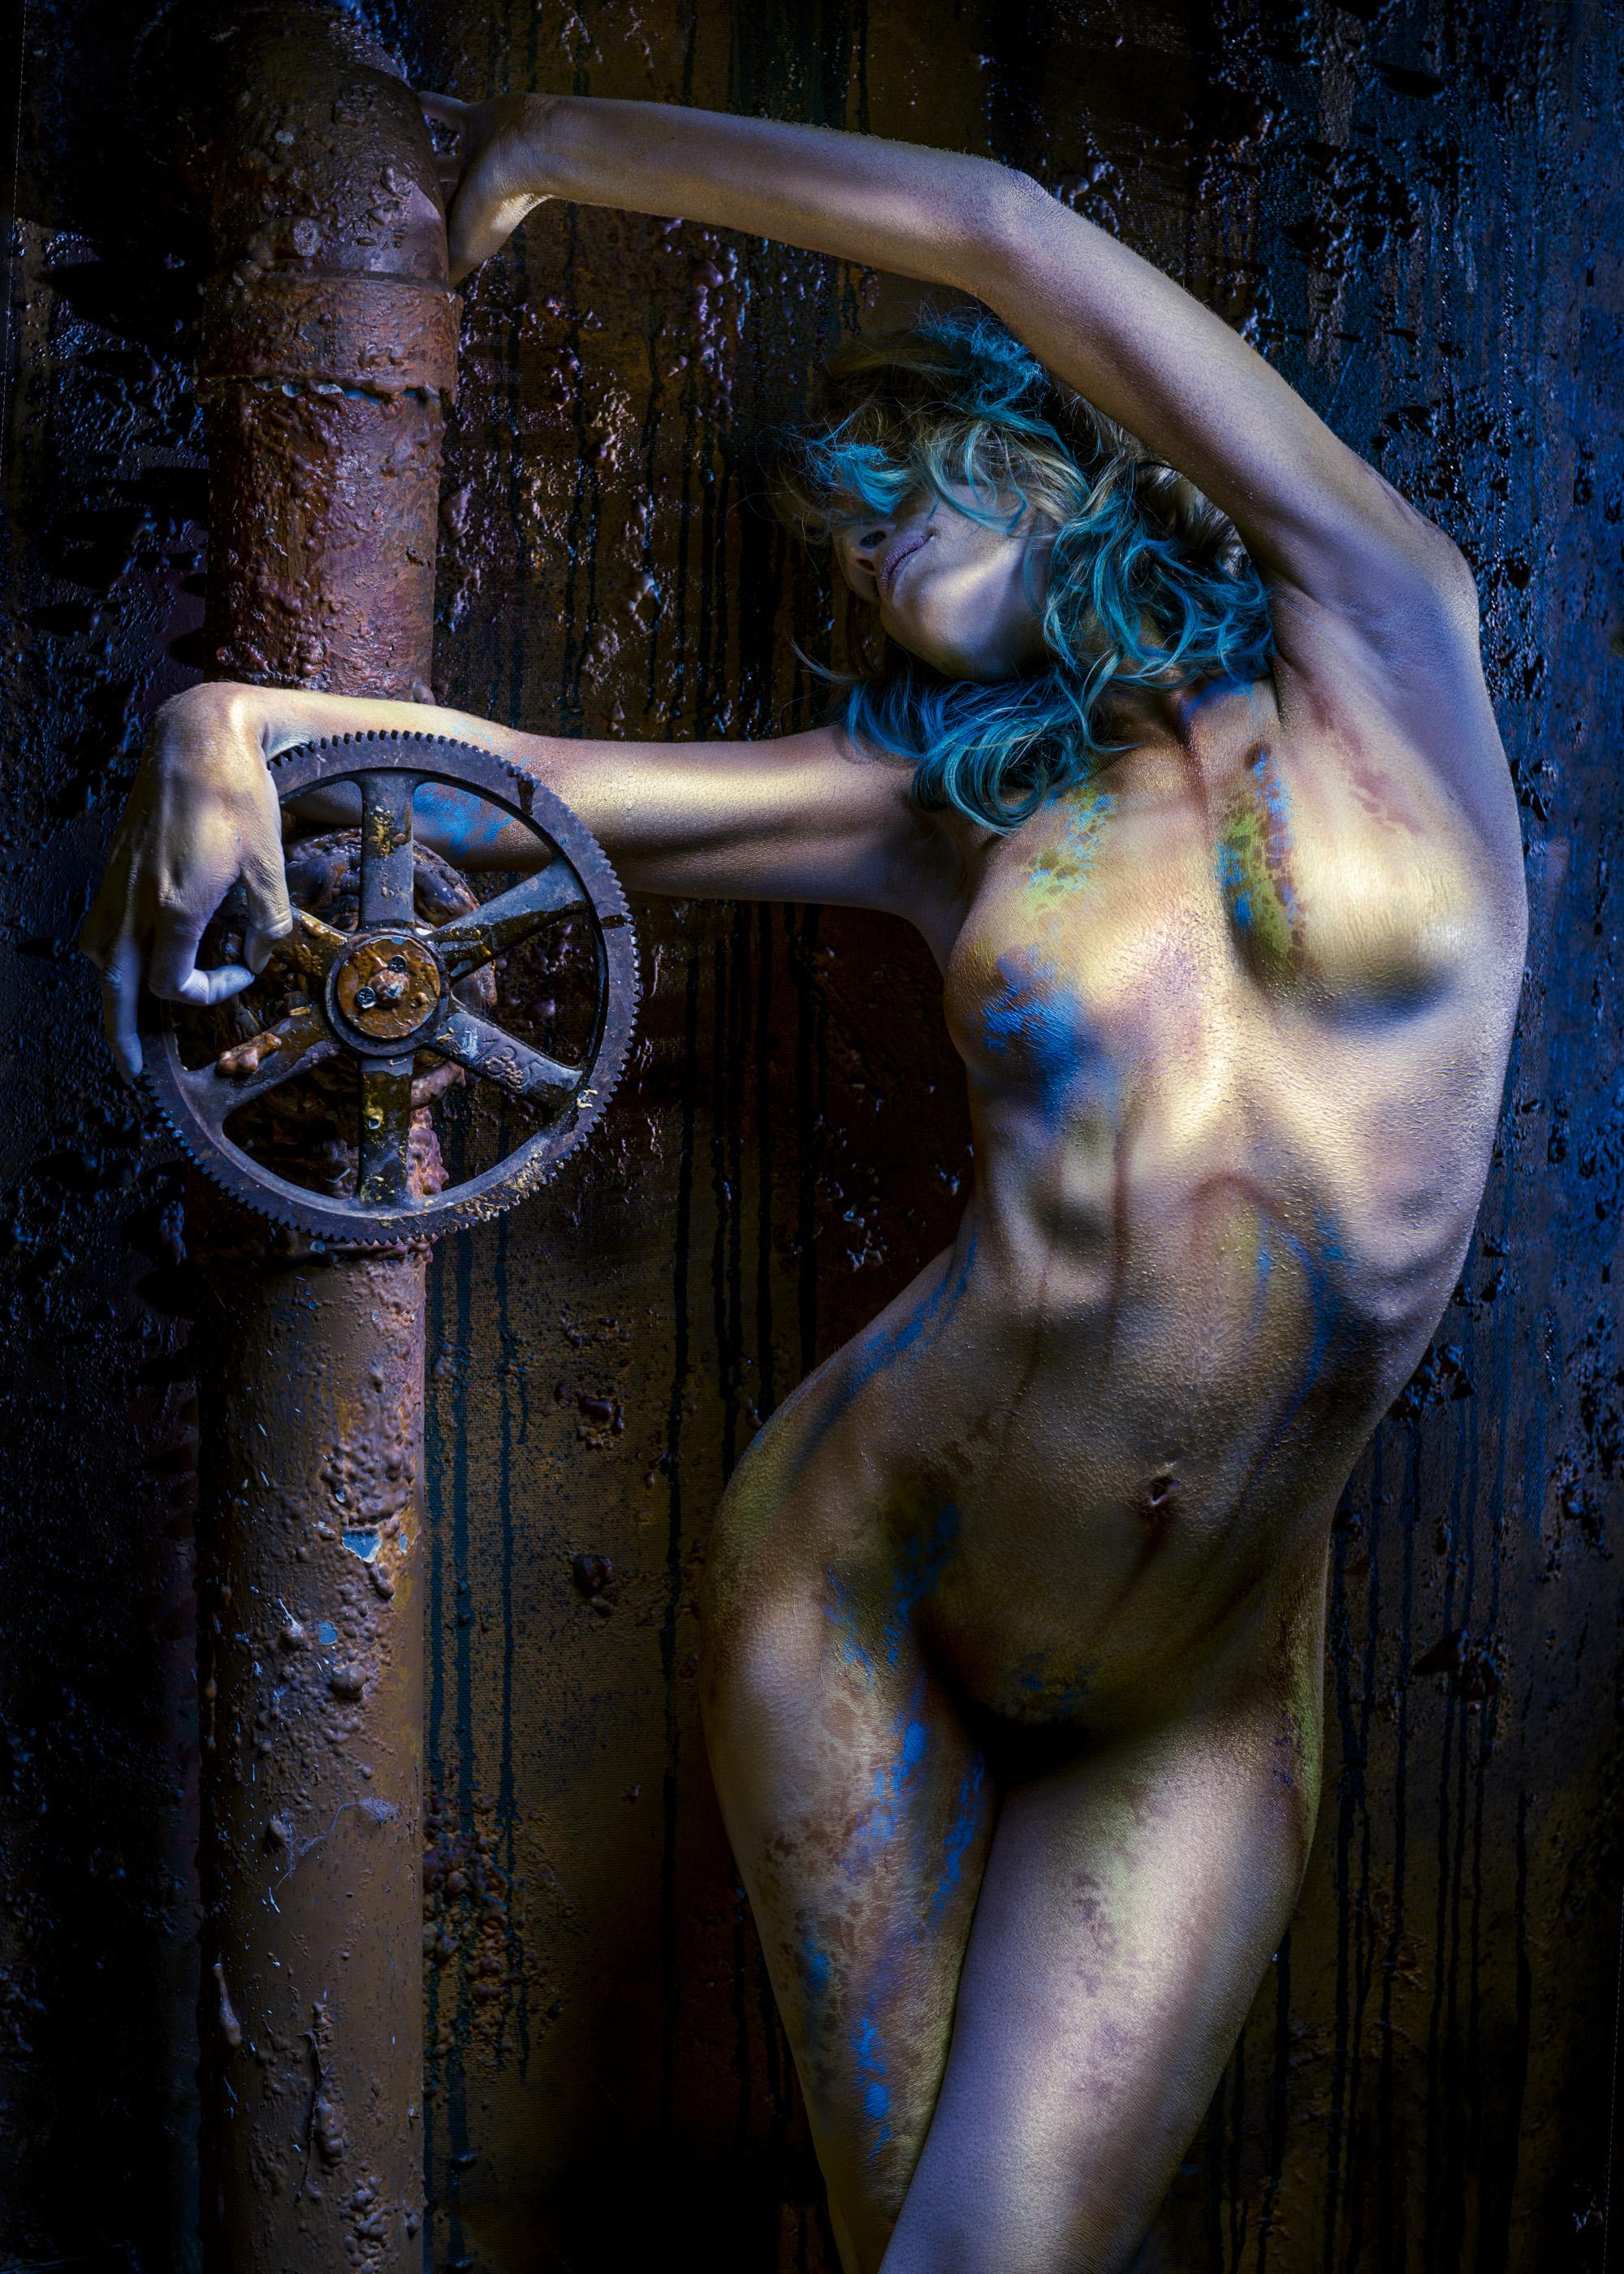 Scott E. Detweiler - Samantha - stylist Tamara Stockman - body paint Ottoz Kustomz